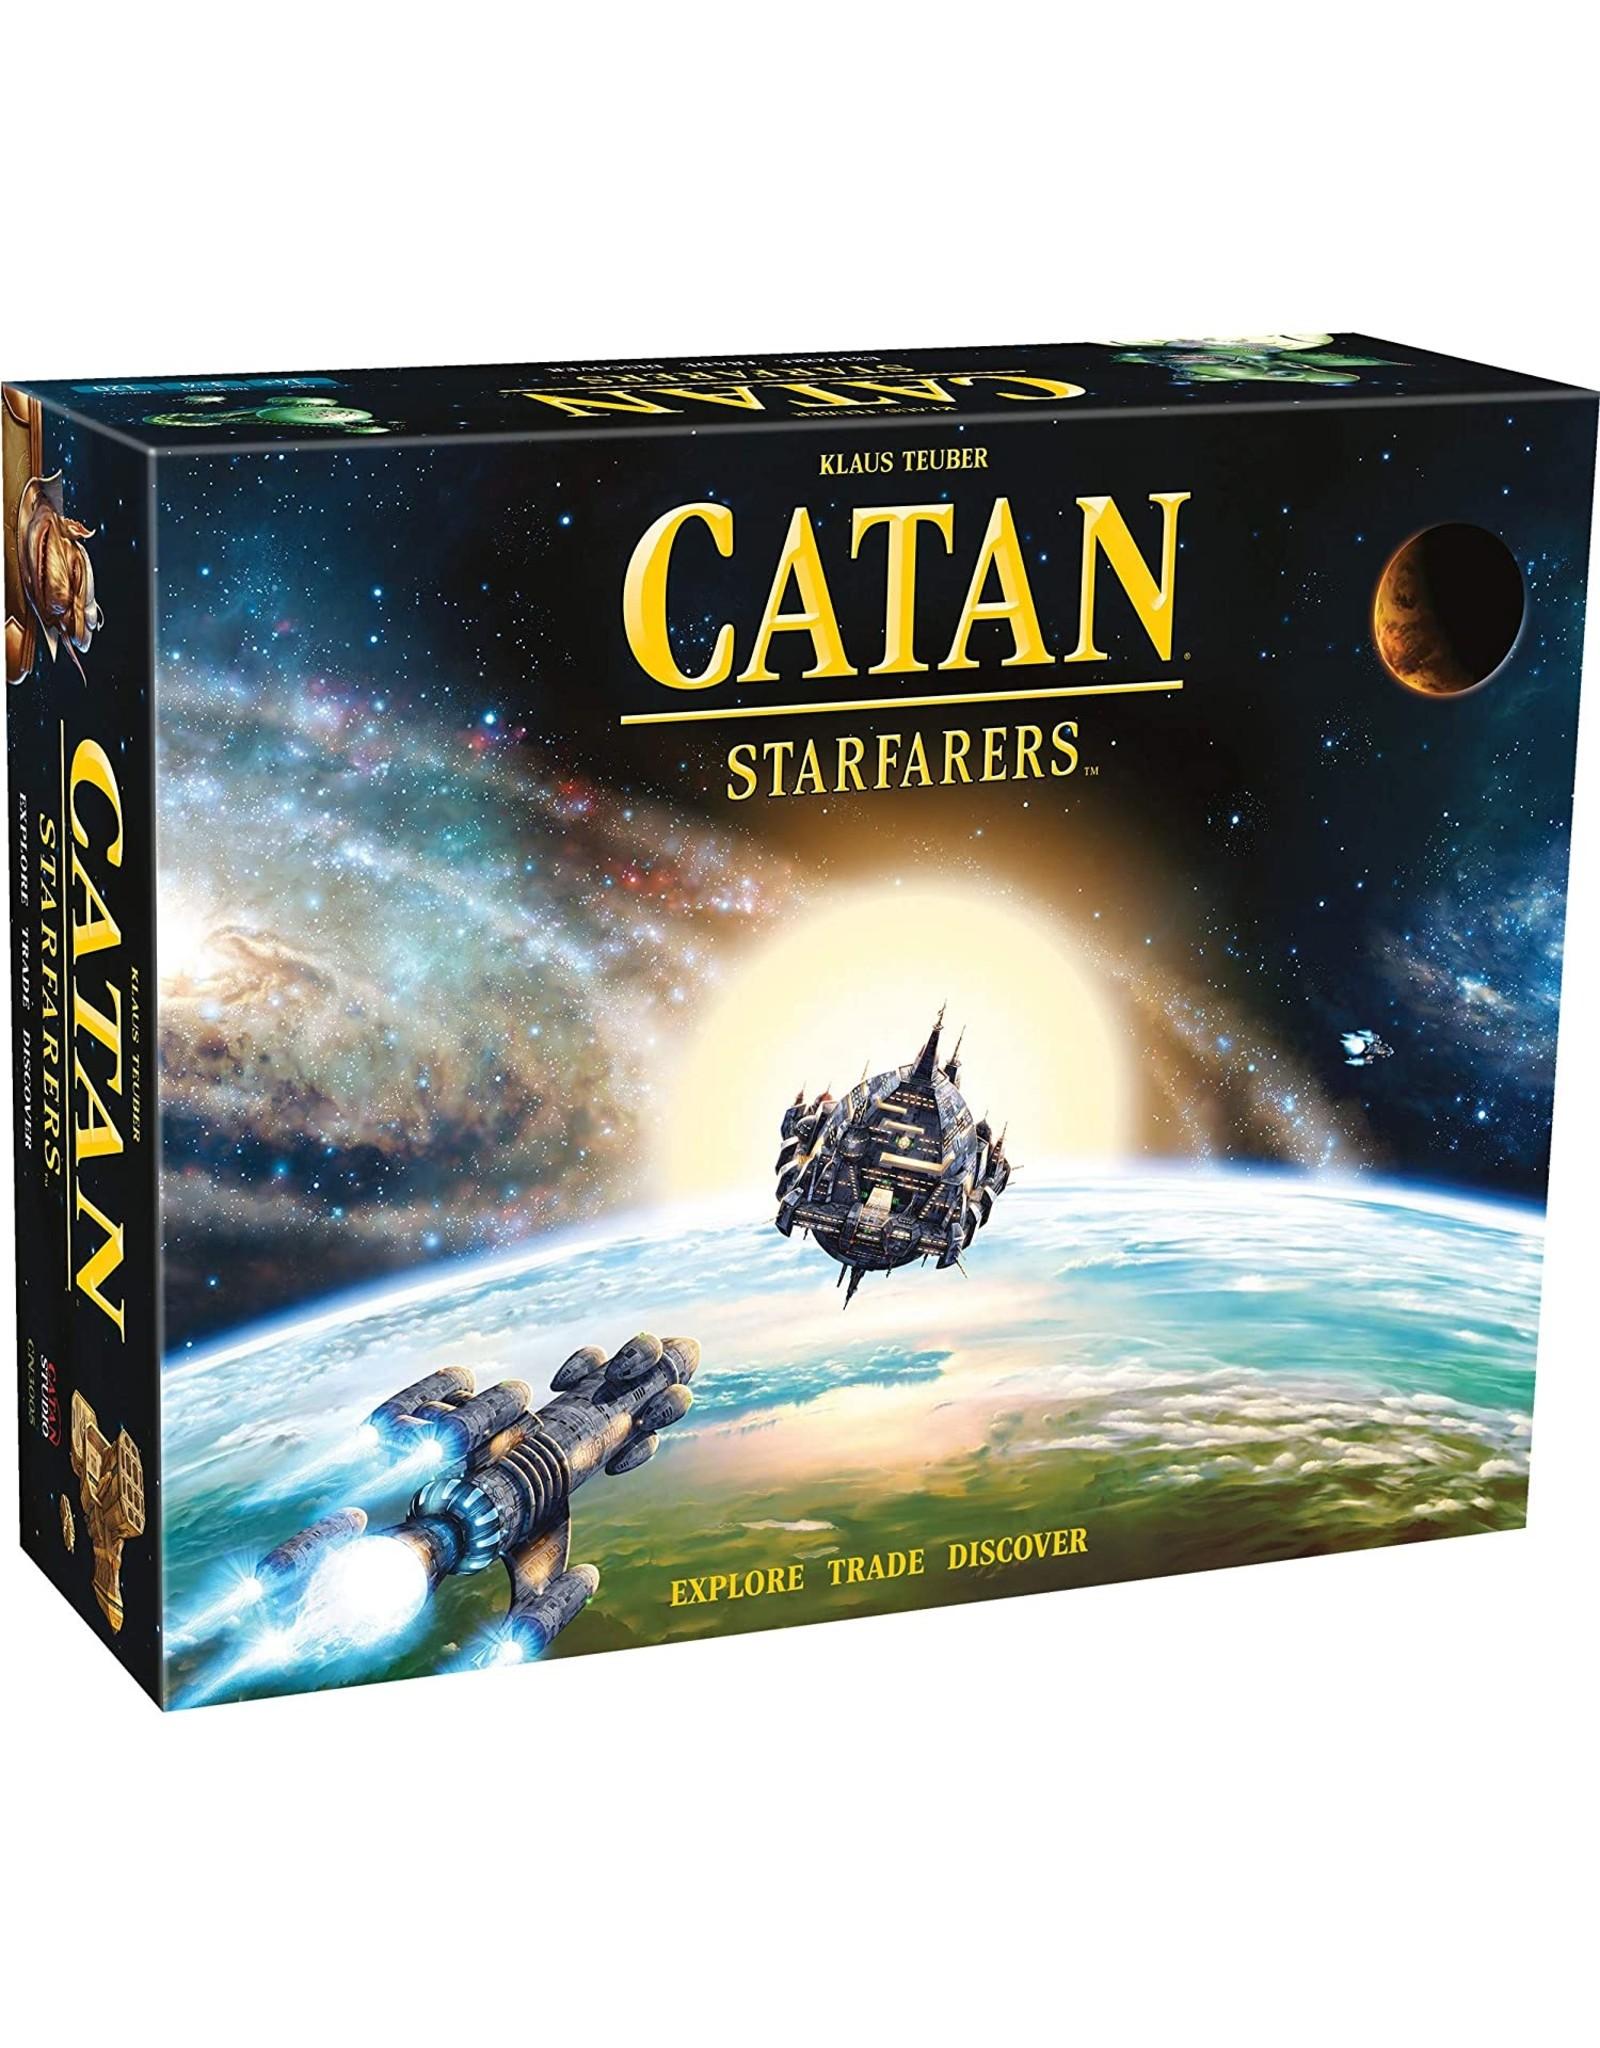 Catan Studio Catan Starfarers